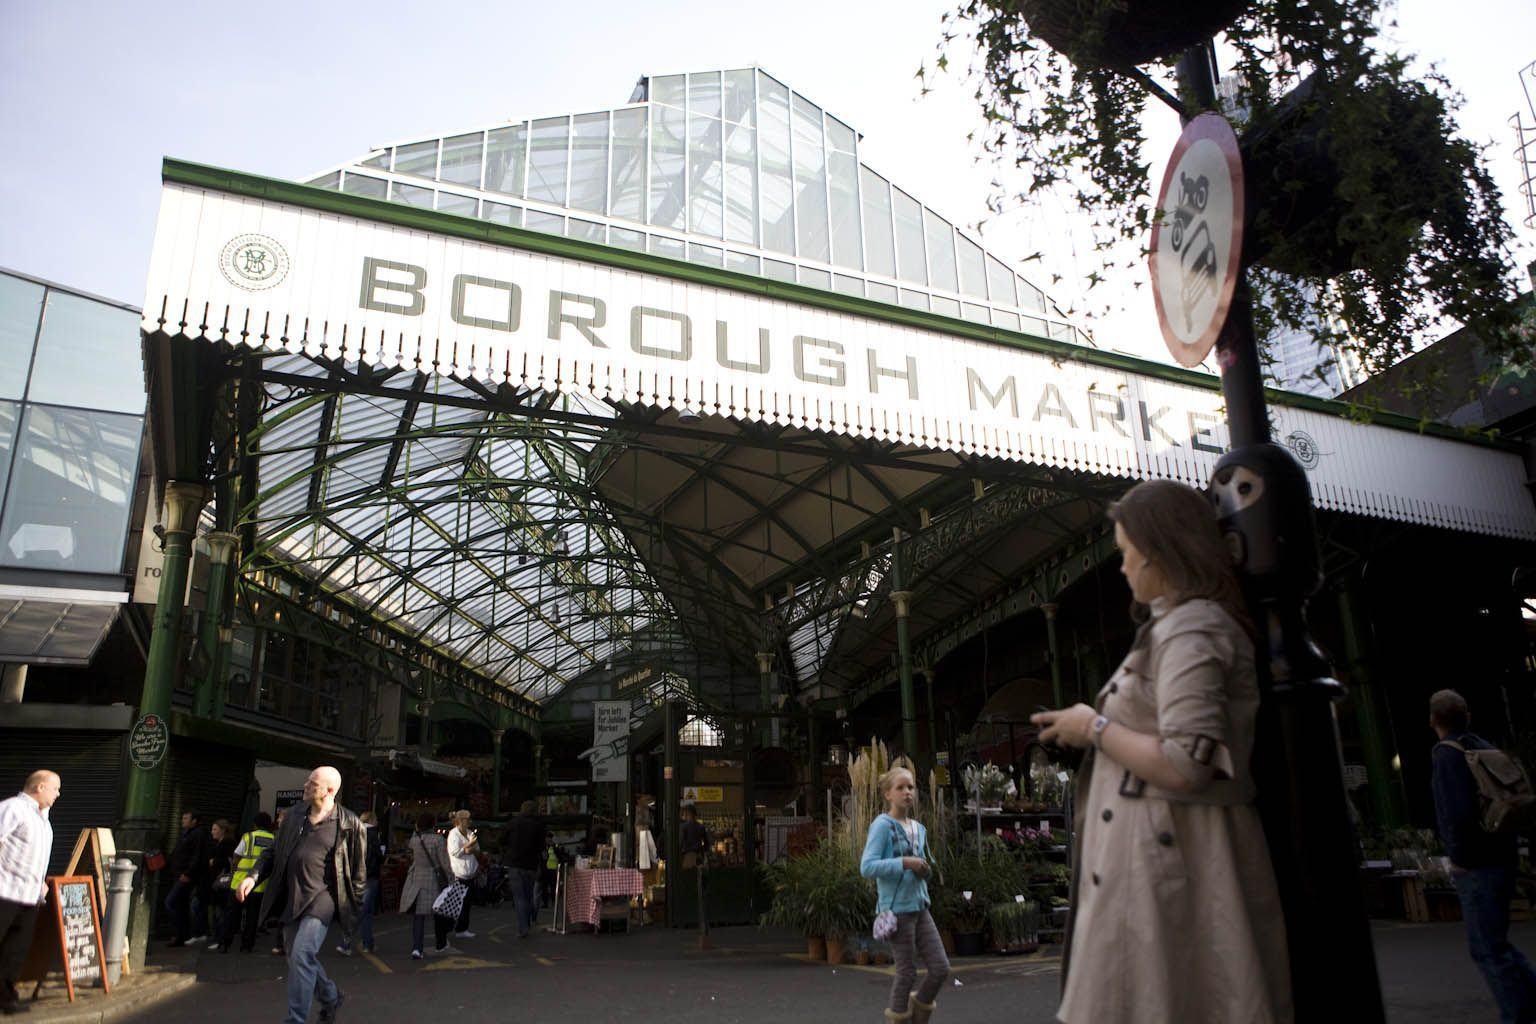 1000 mistletoe kisses event at the borough market